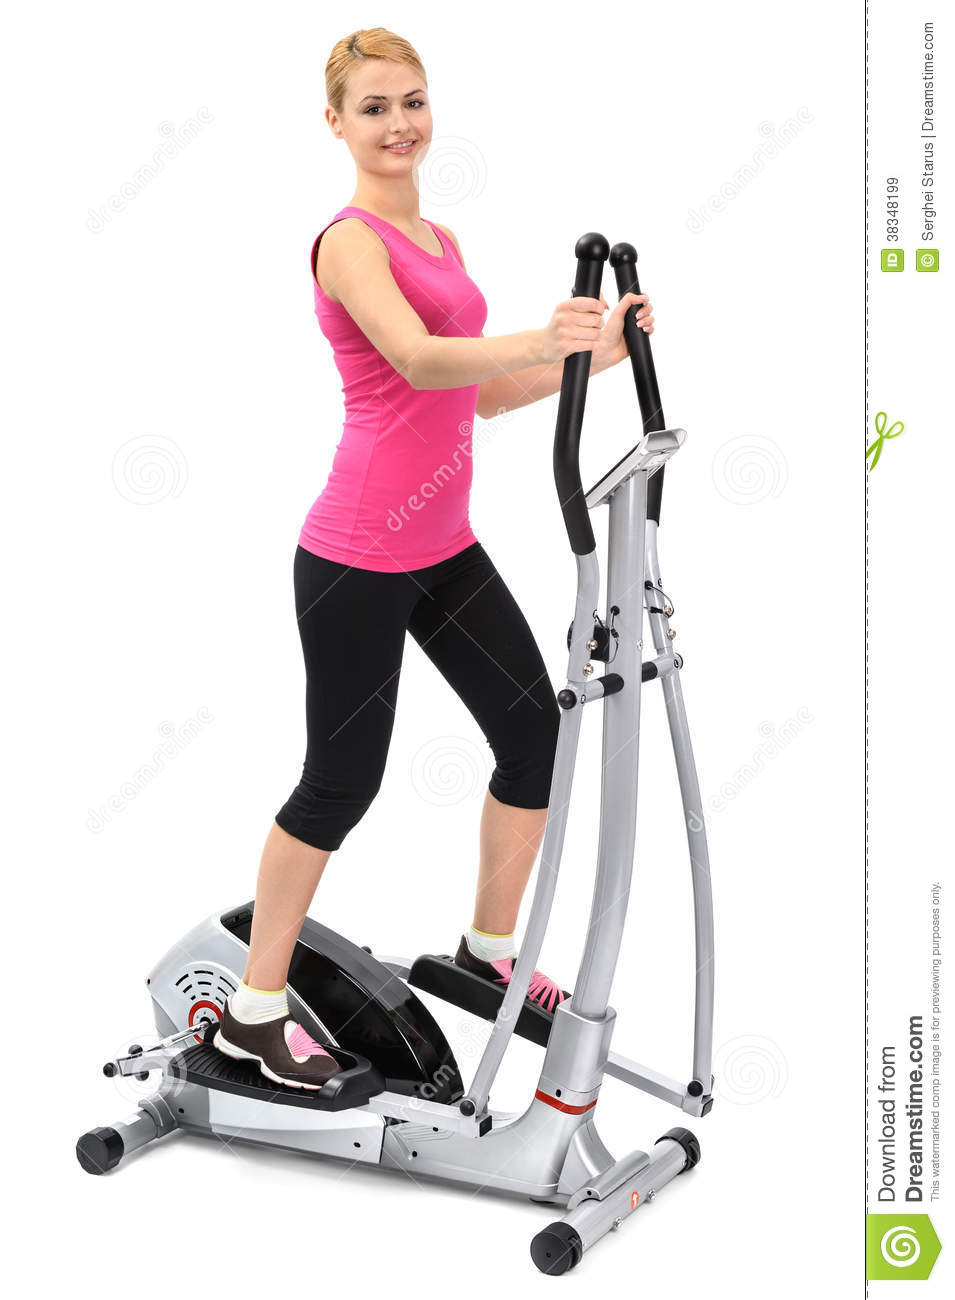 Woman on elliptical clipart.